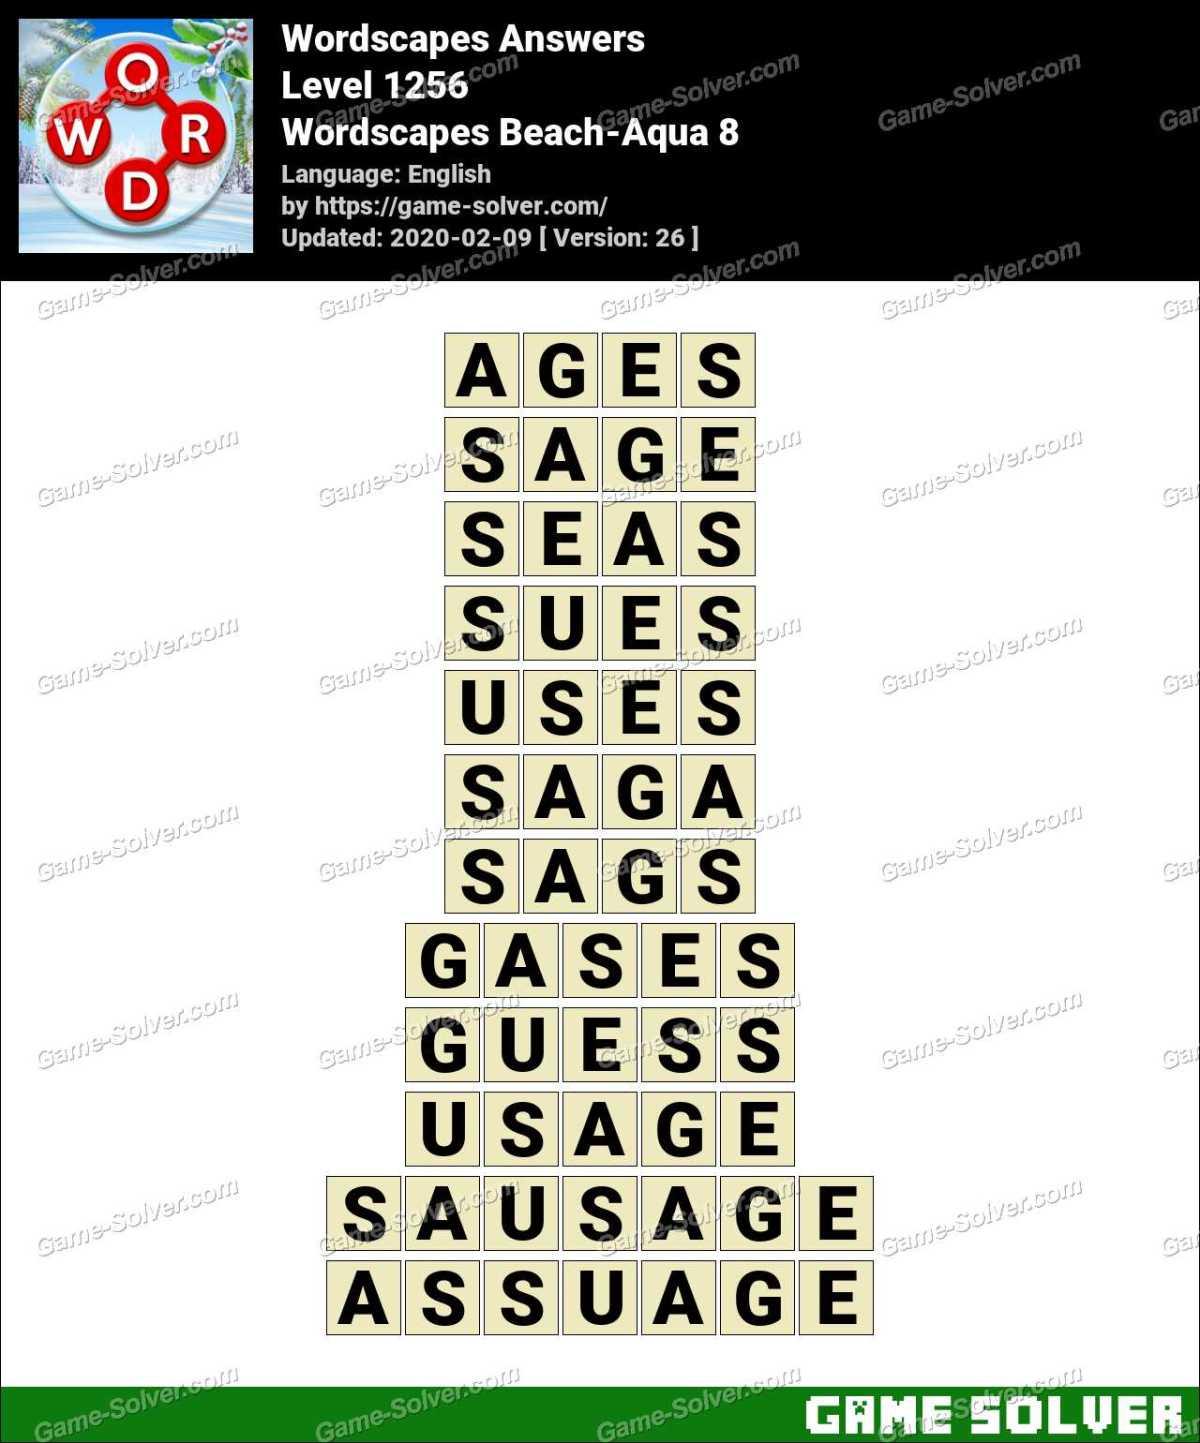 Wordscapes Beach-Aqua 8 Answers